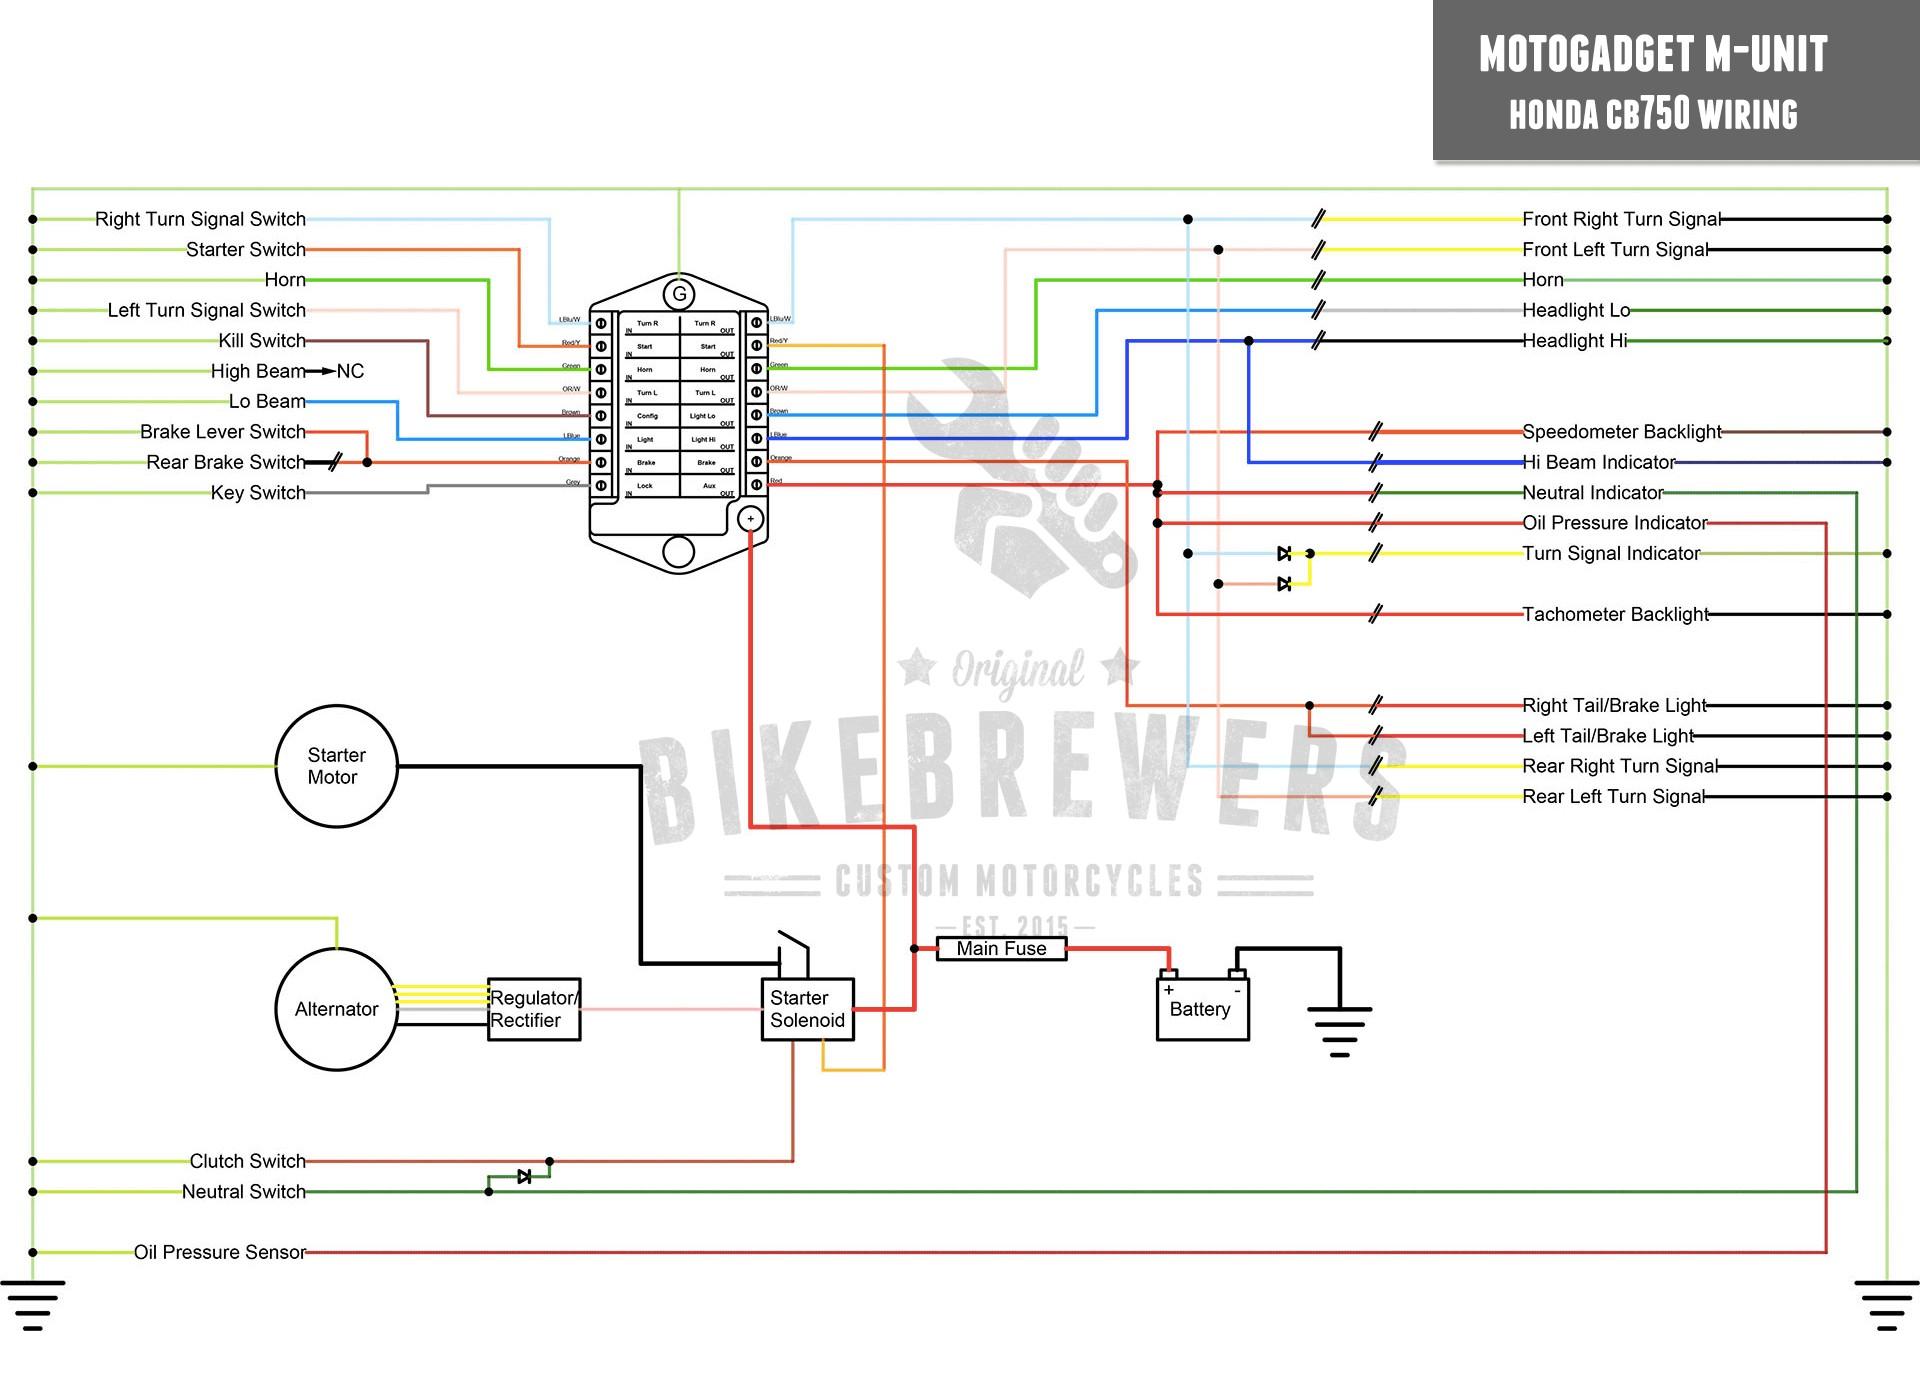 Bicycle Moped Wiring Diagram